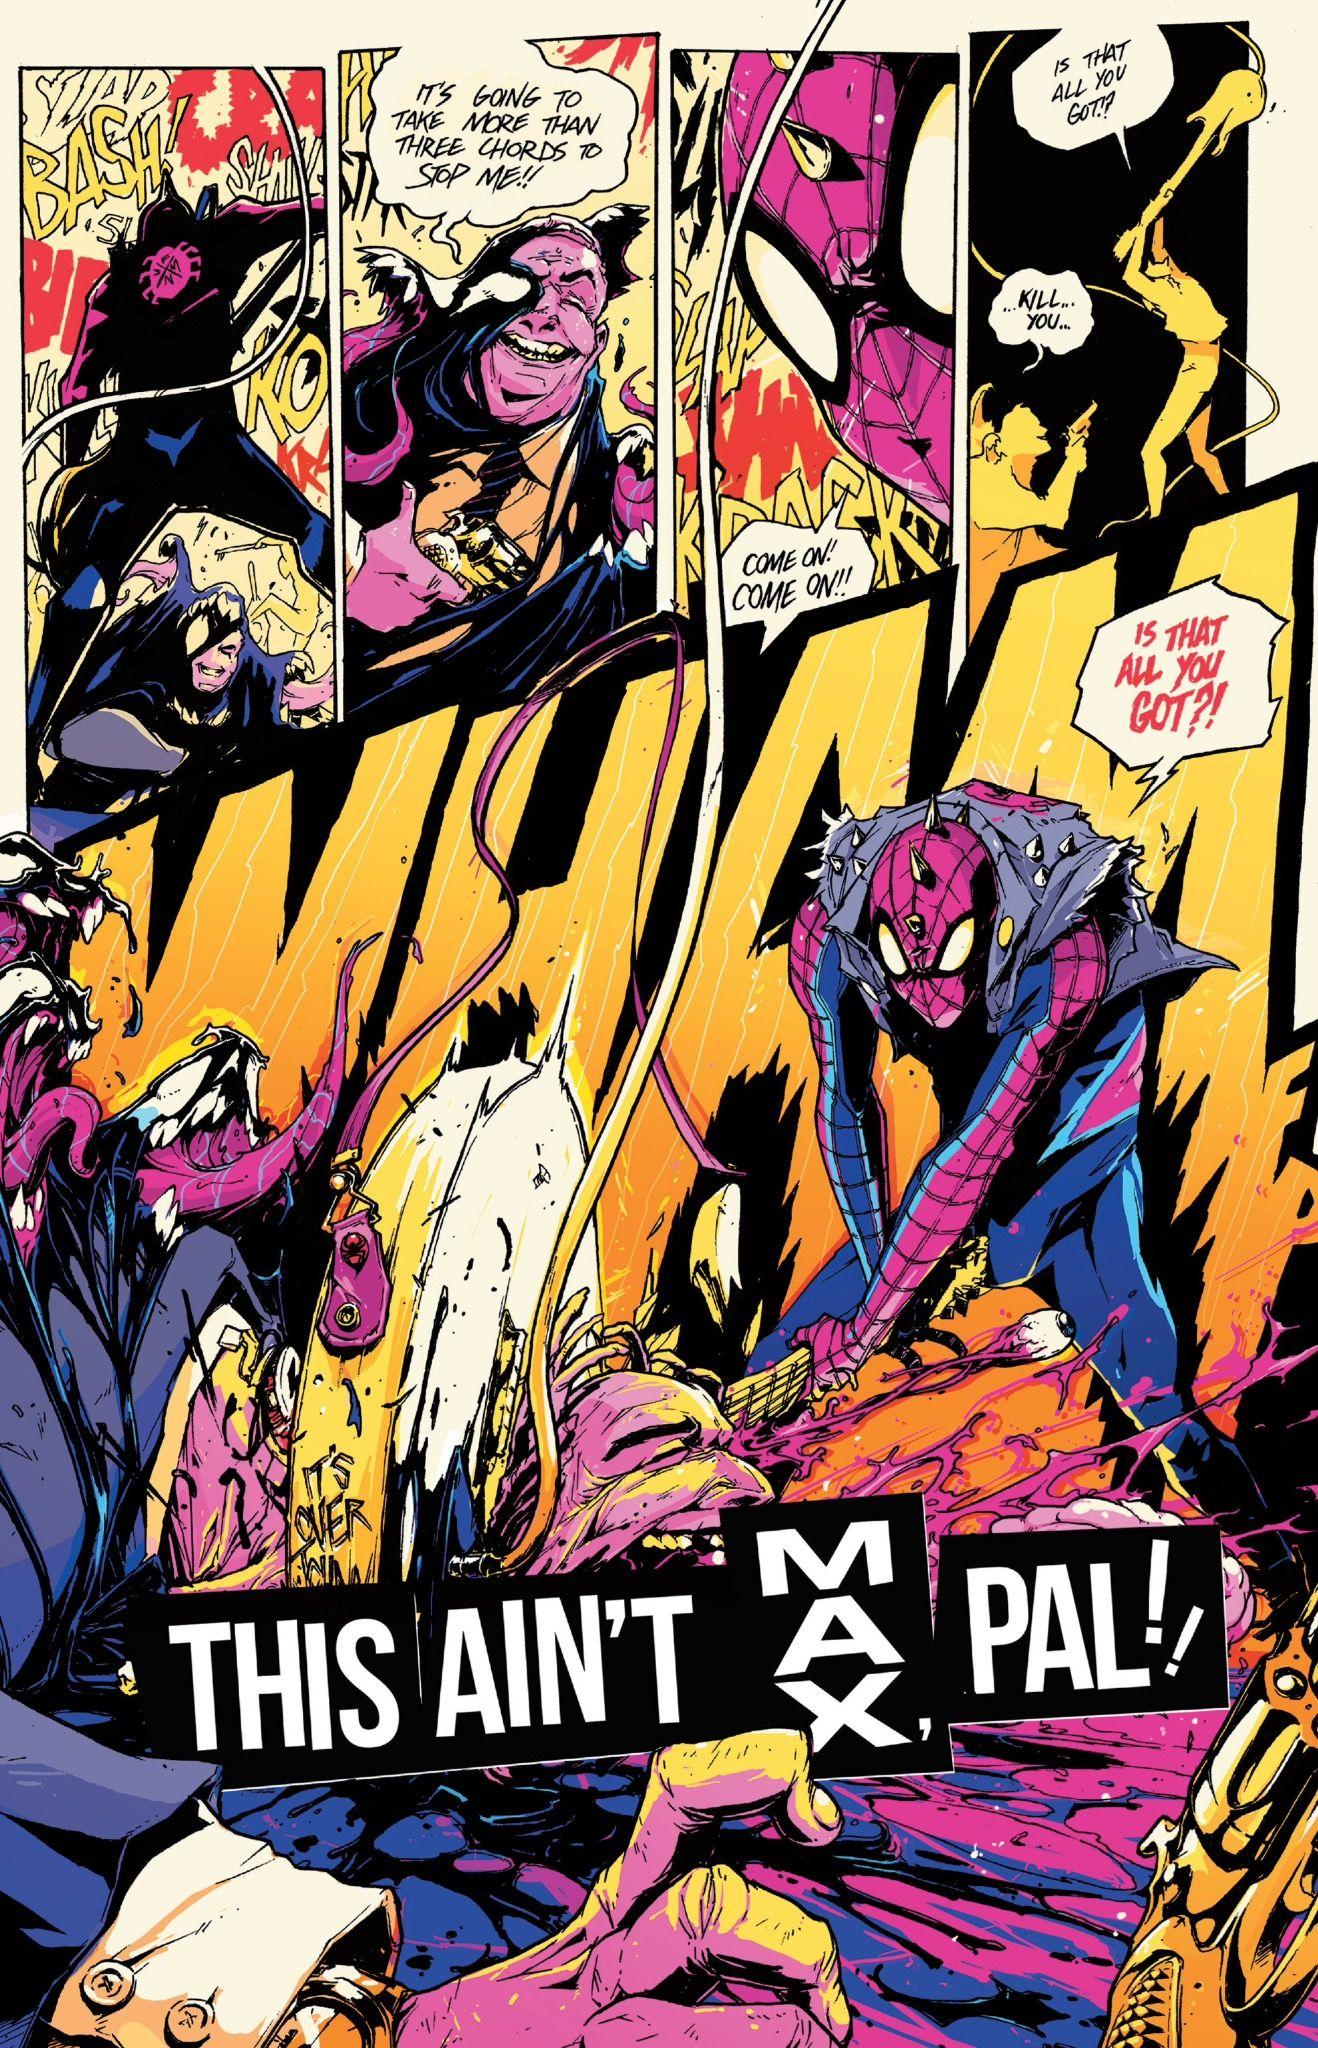 The birth of Spider-Punk from Spider-Verse #2